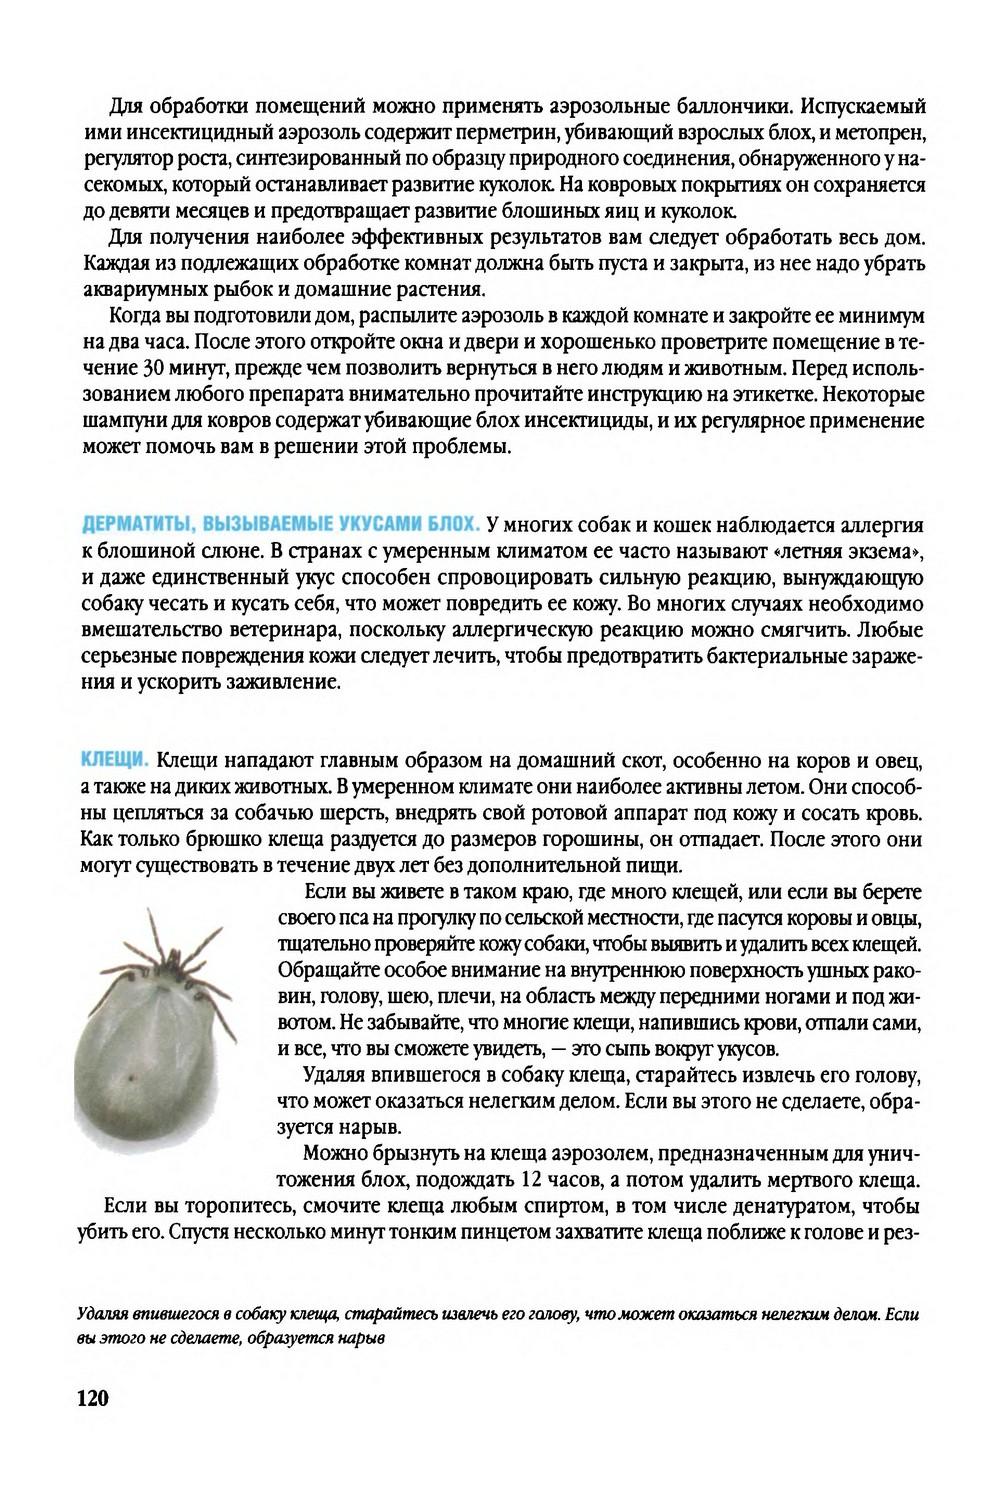 http://i1.imageban.ru/out/2014/01/18/d7e7e19740b8322685aa628c96e22113.jpg